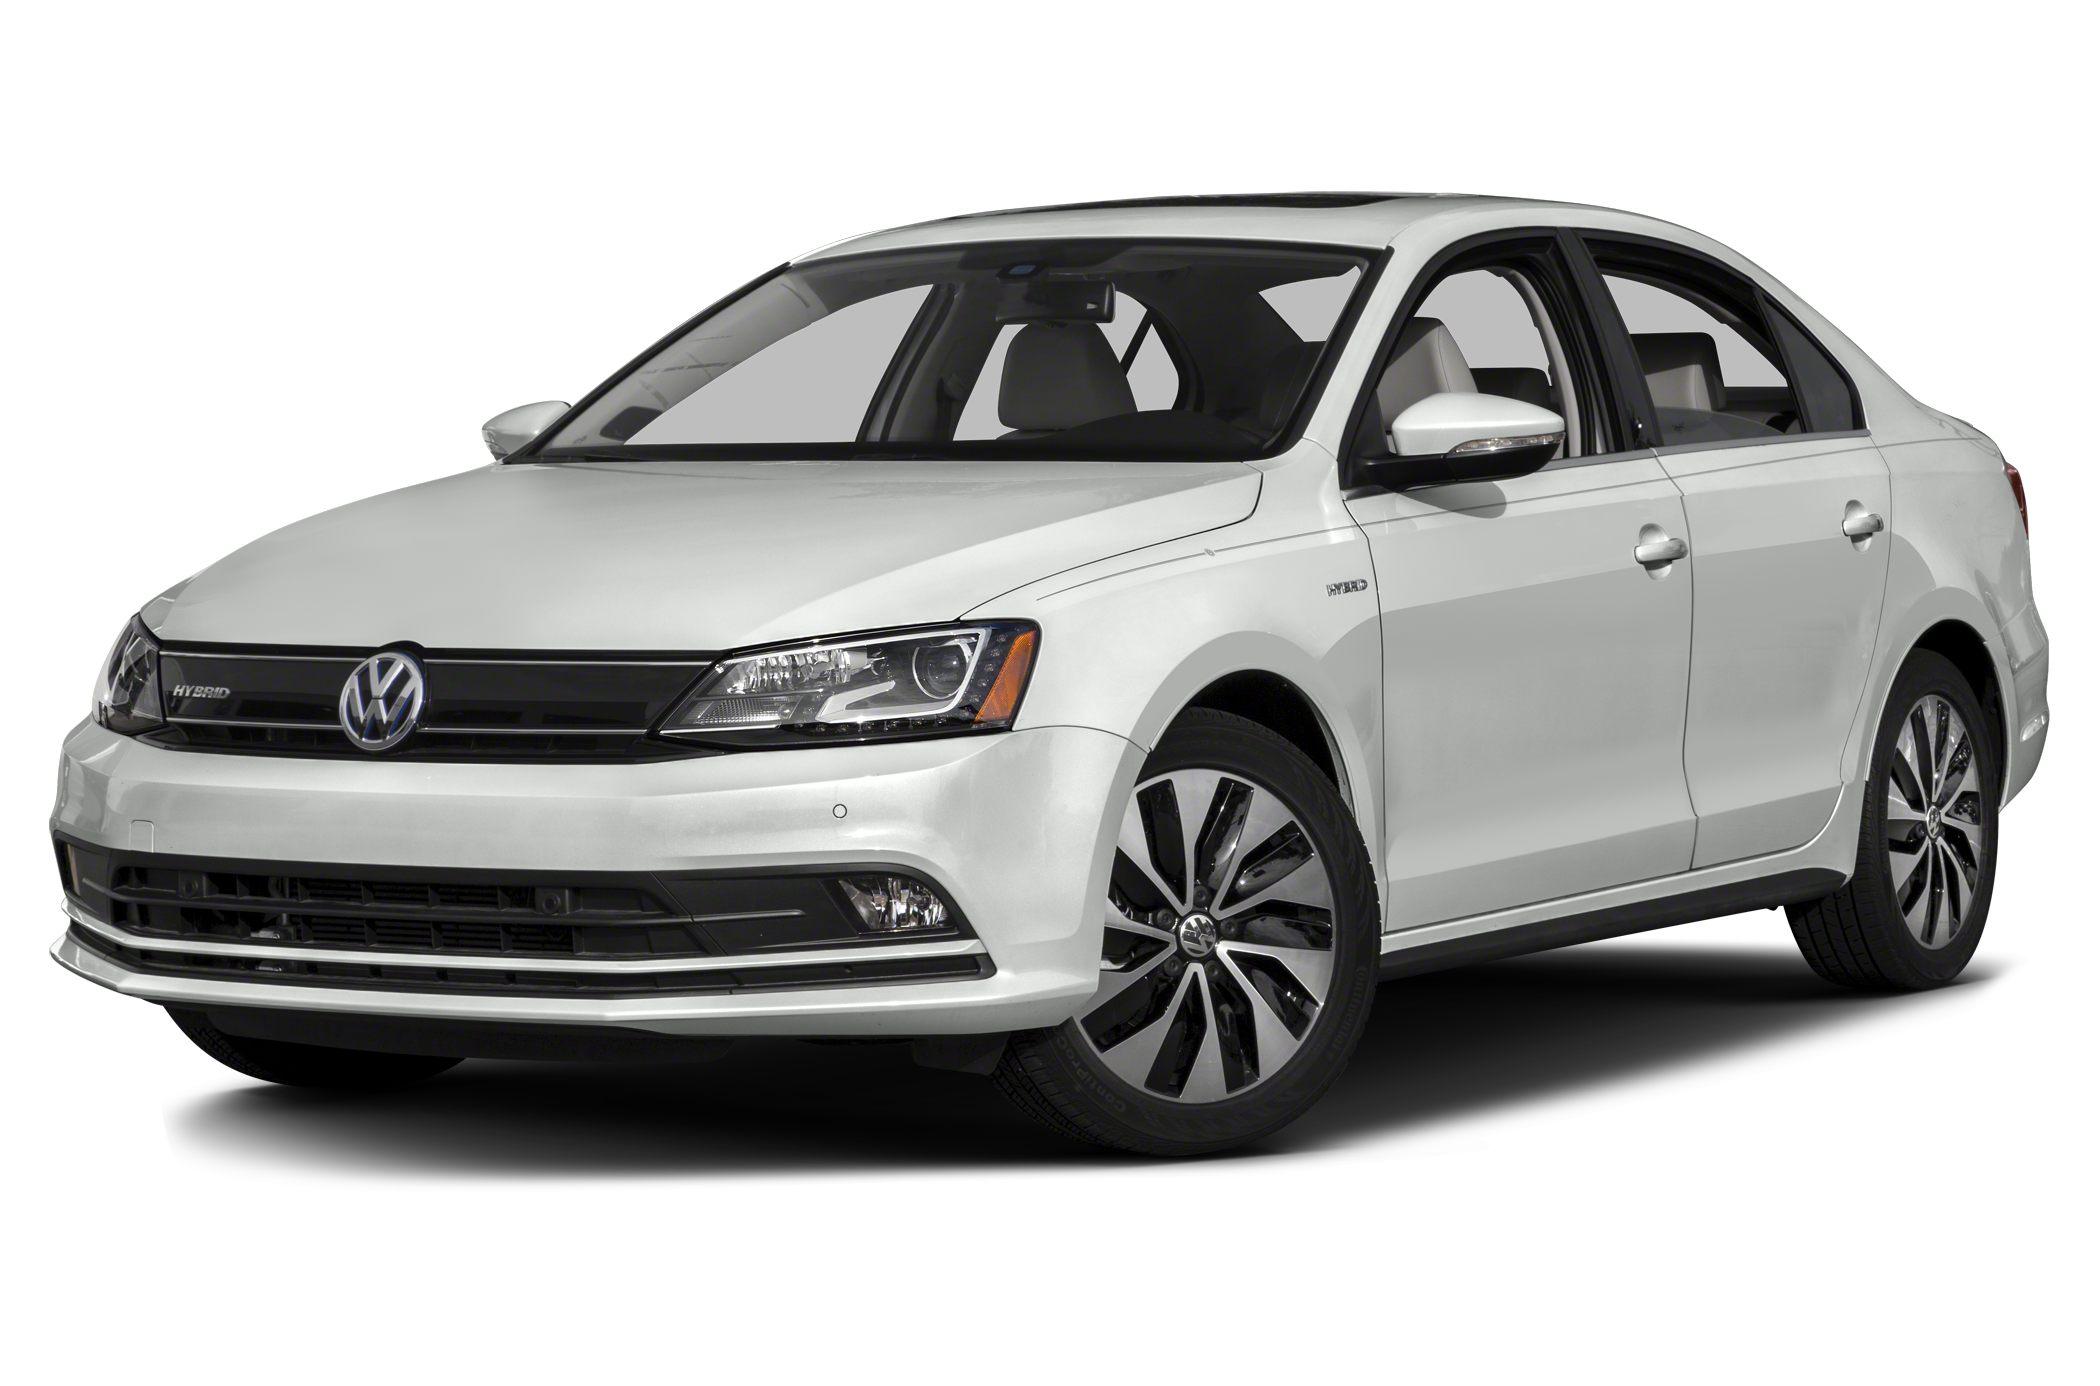 Sel Premium 4dr Sedan 2016 Volkswagen Jetta Hybrid Photos